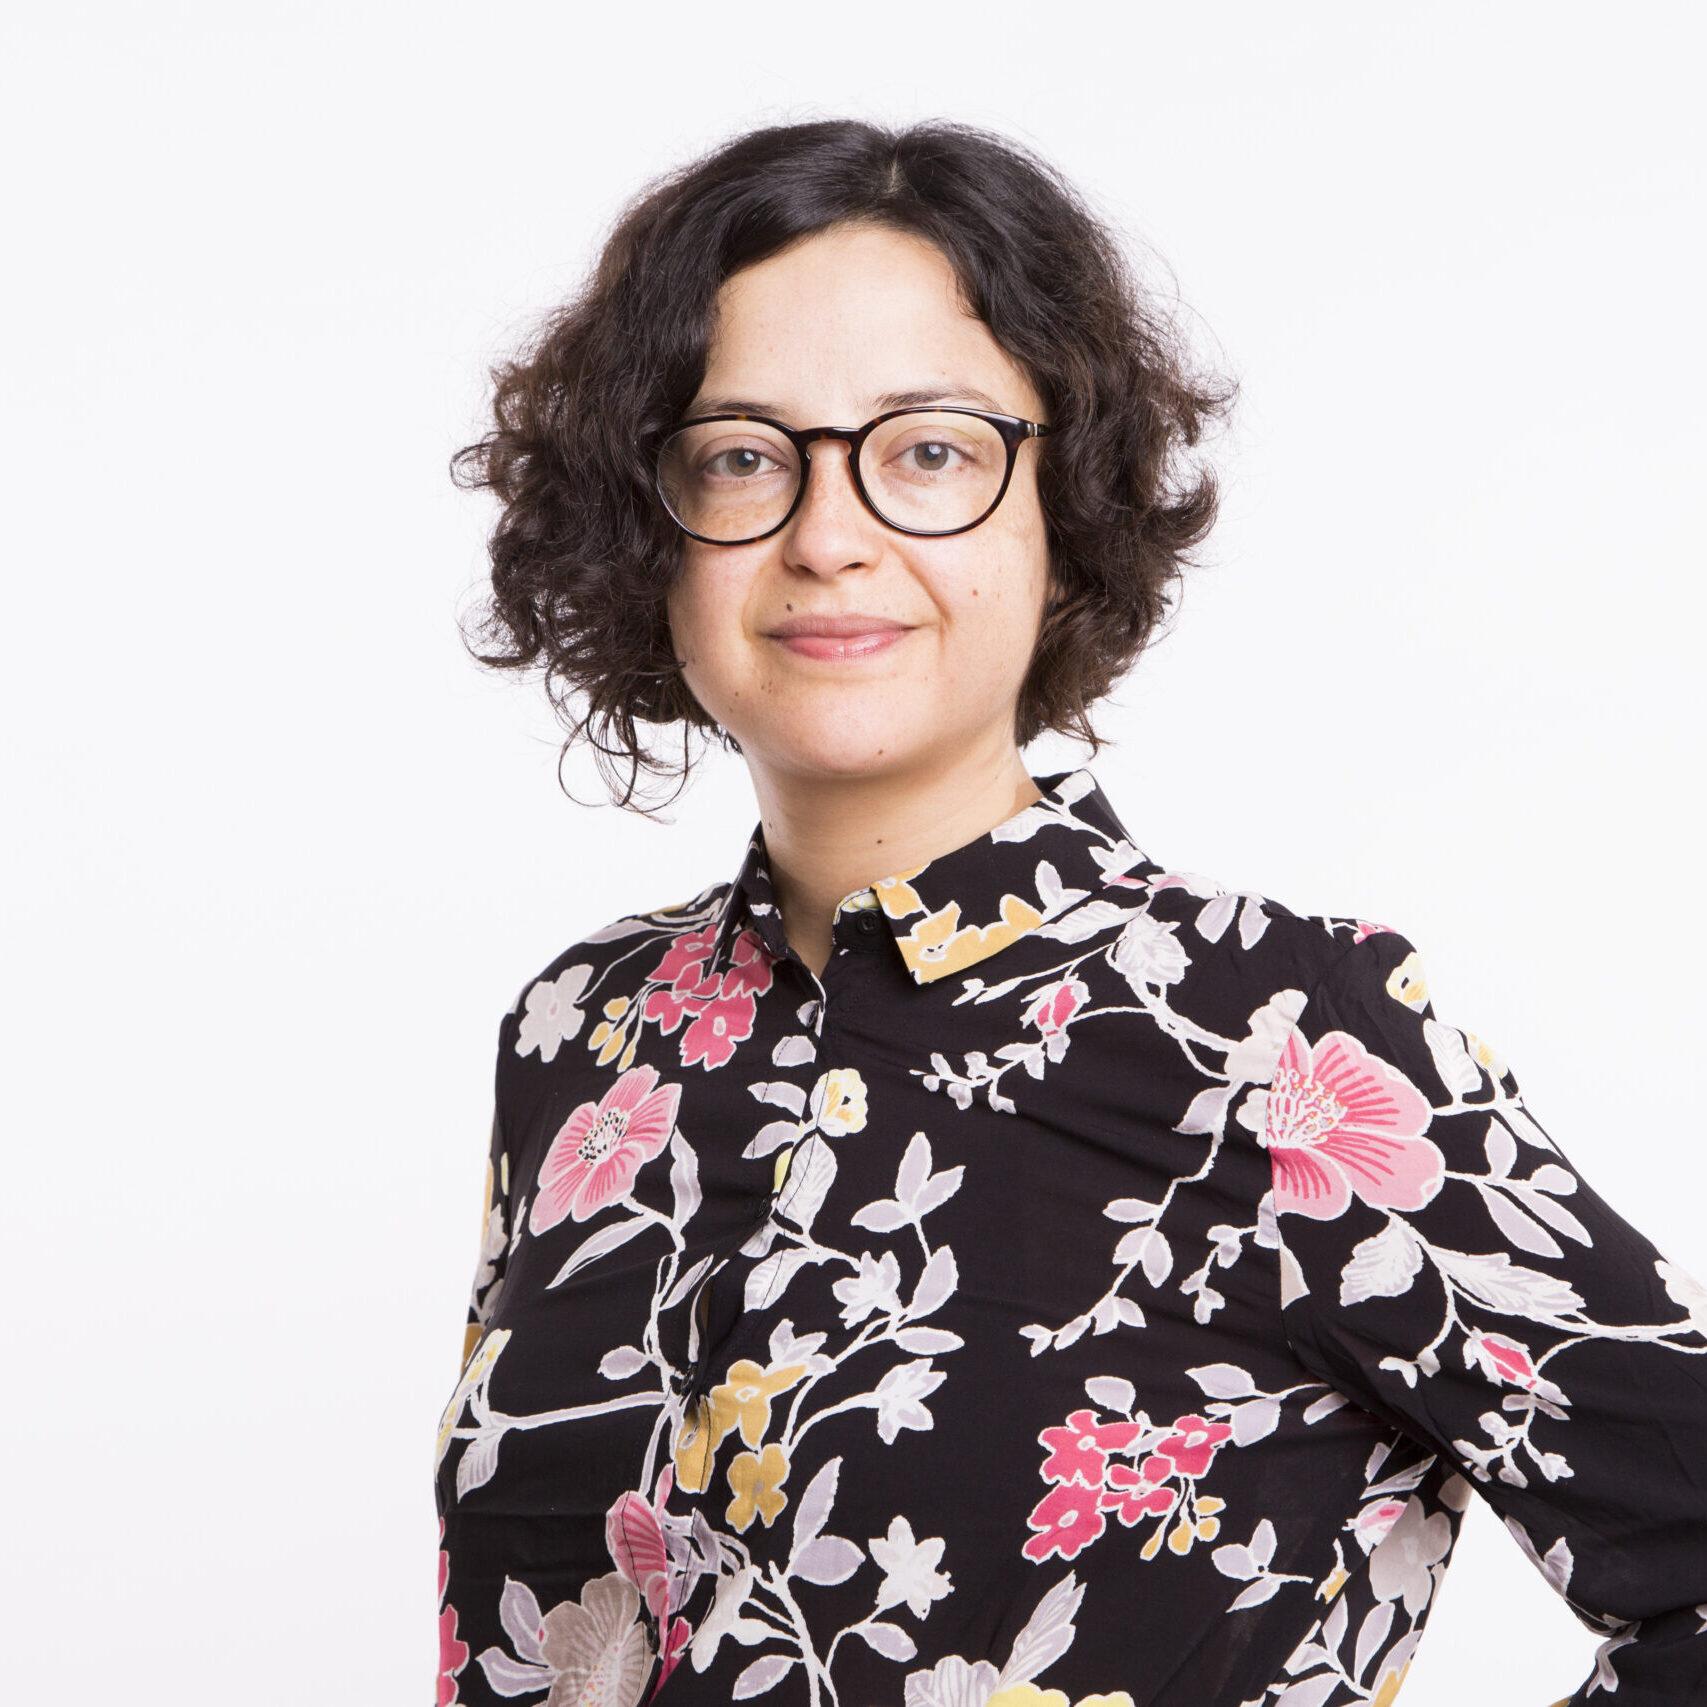 Nadia Hakim-033-BearbeitetNadia Hakim-033-BearbeitetNadiaHakimPRINT